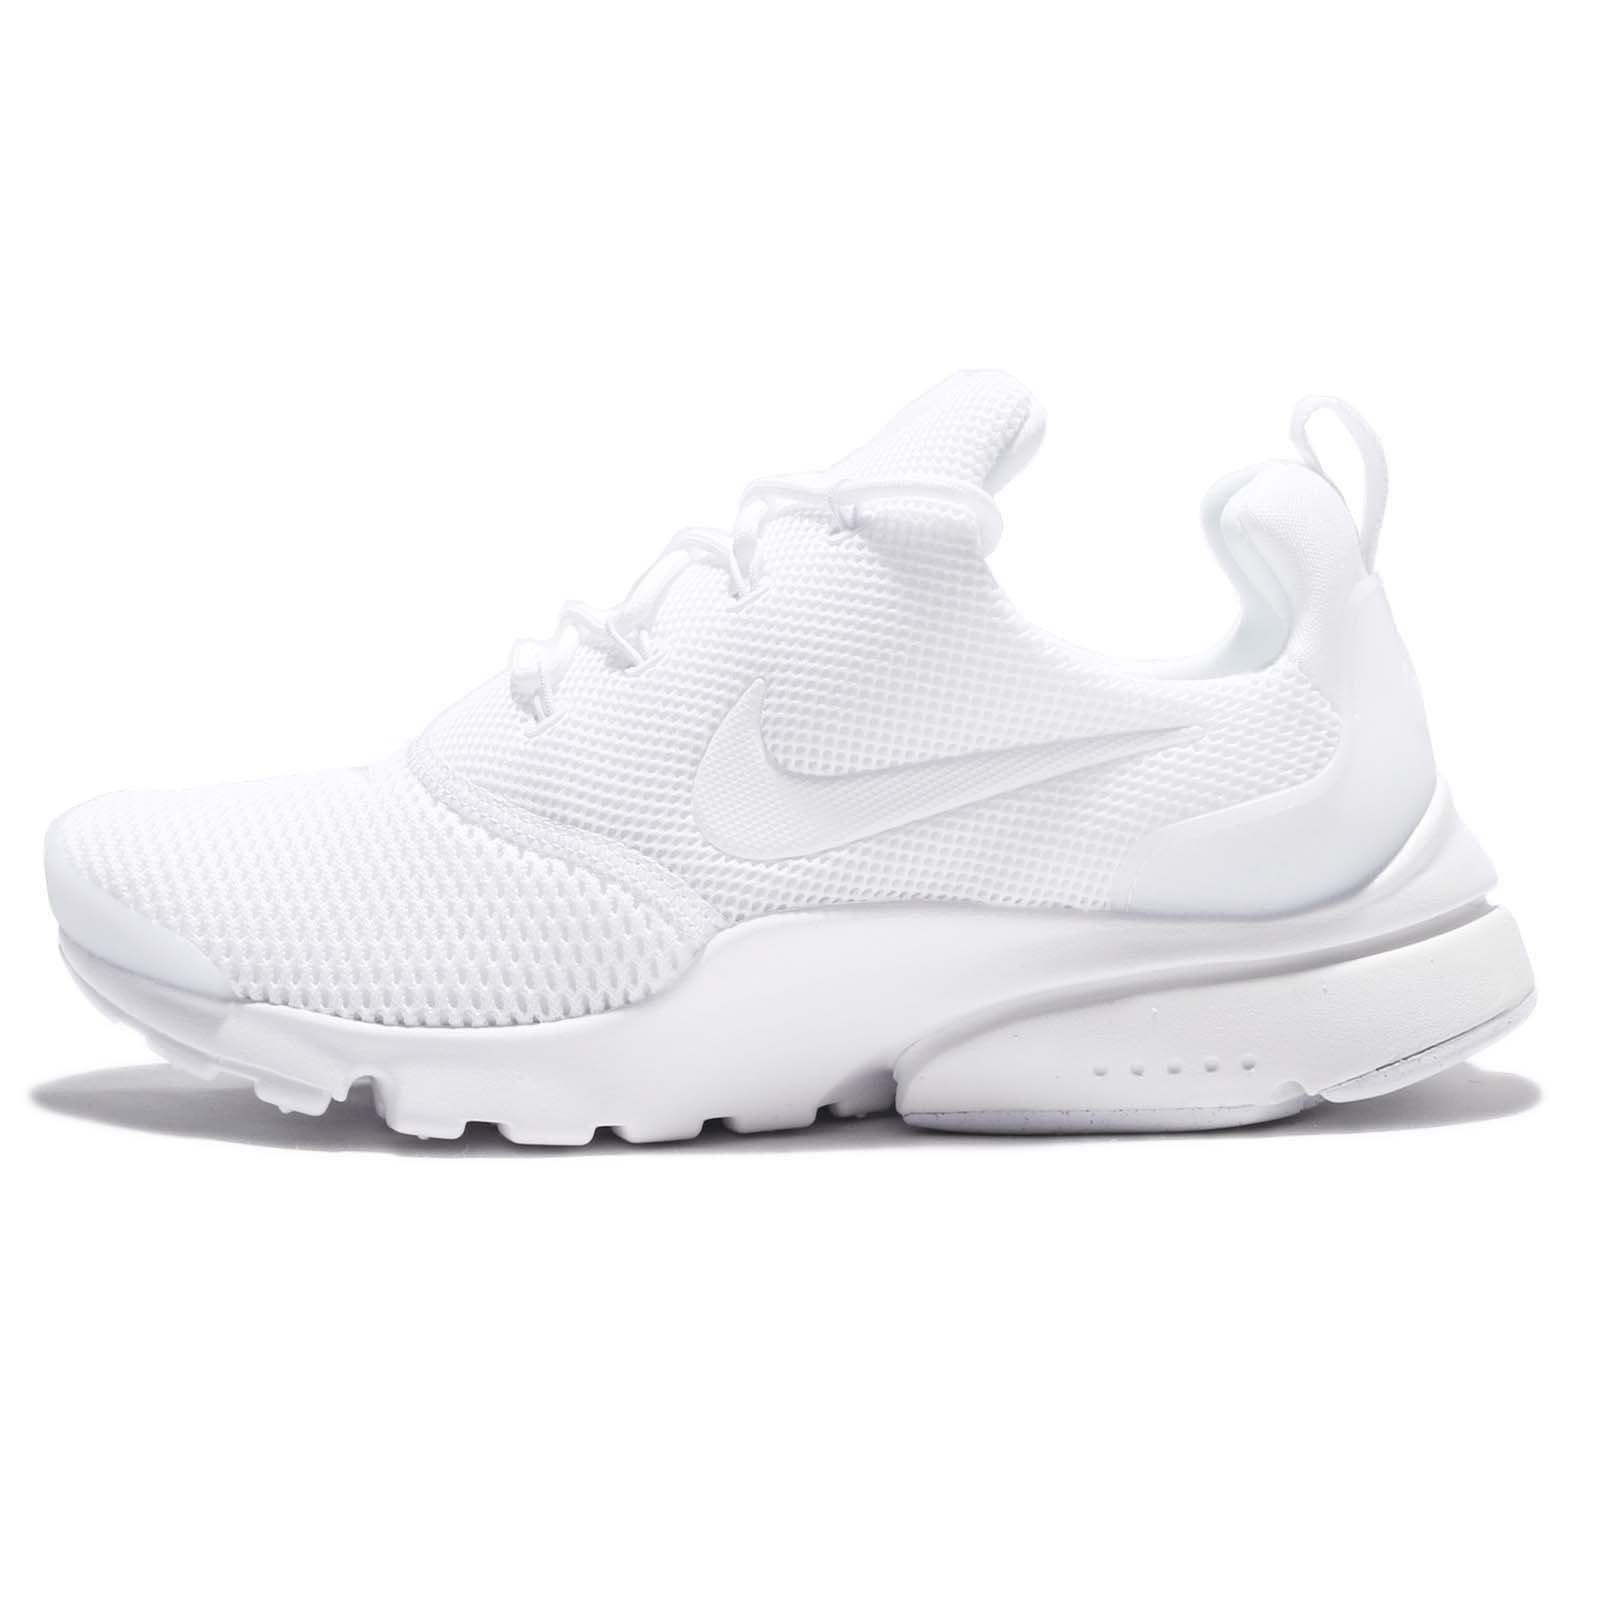 Nike Women\u0027s Presto Fly White/White,White Ankle,High Running Shoe , 10M